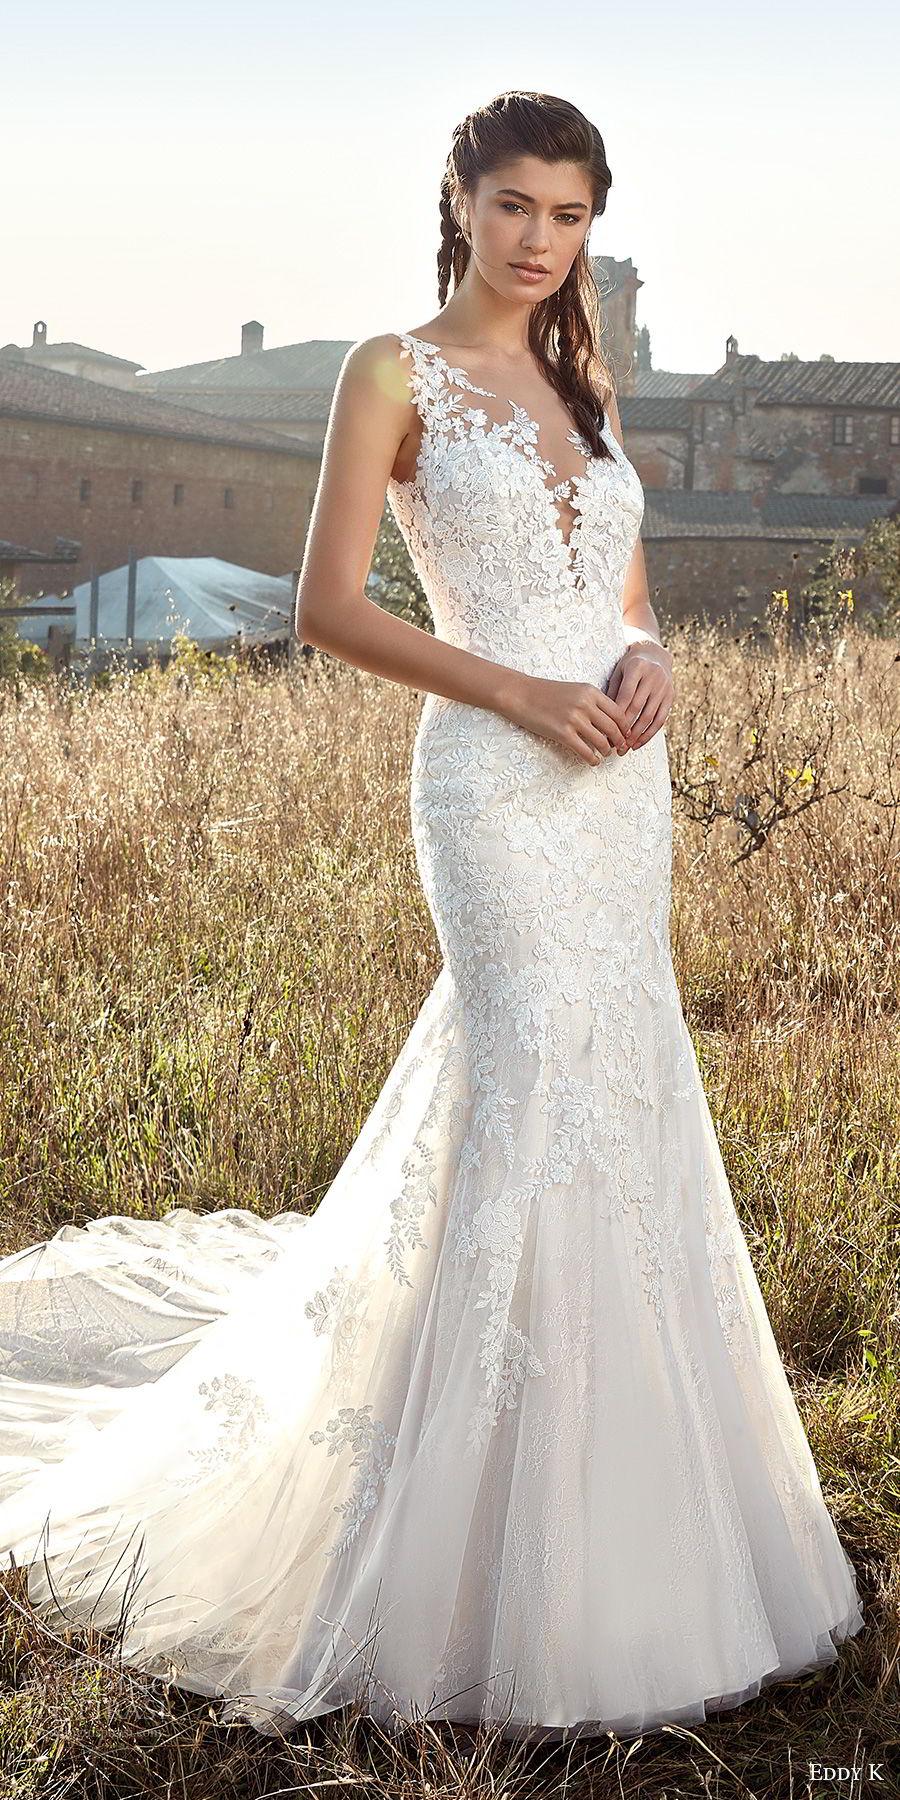 84fc5574c6e1e eddy k 2019 ek sleeveless deep plunging sweetheart neckline heavily  embellished bodice elegant mermaid wedding dress